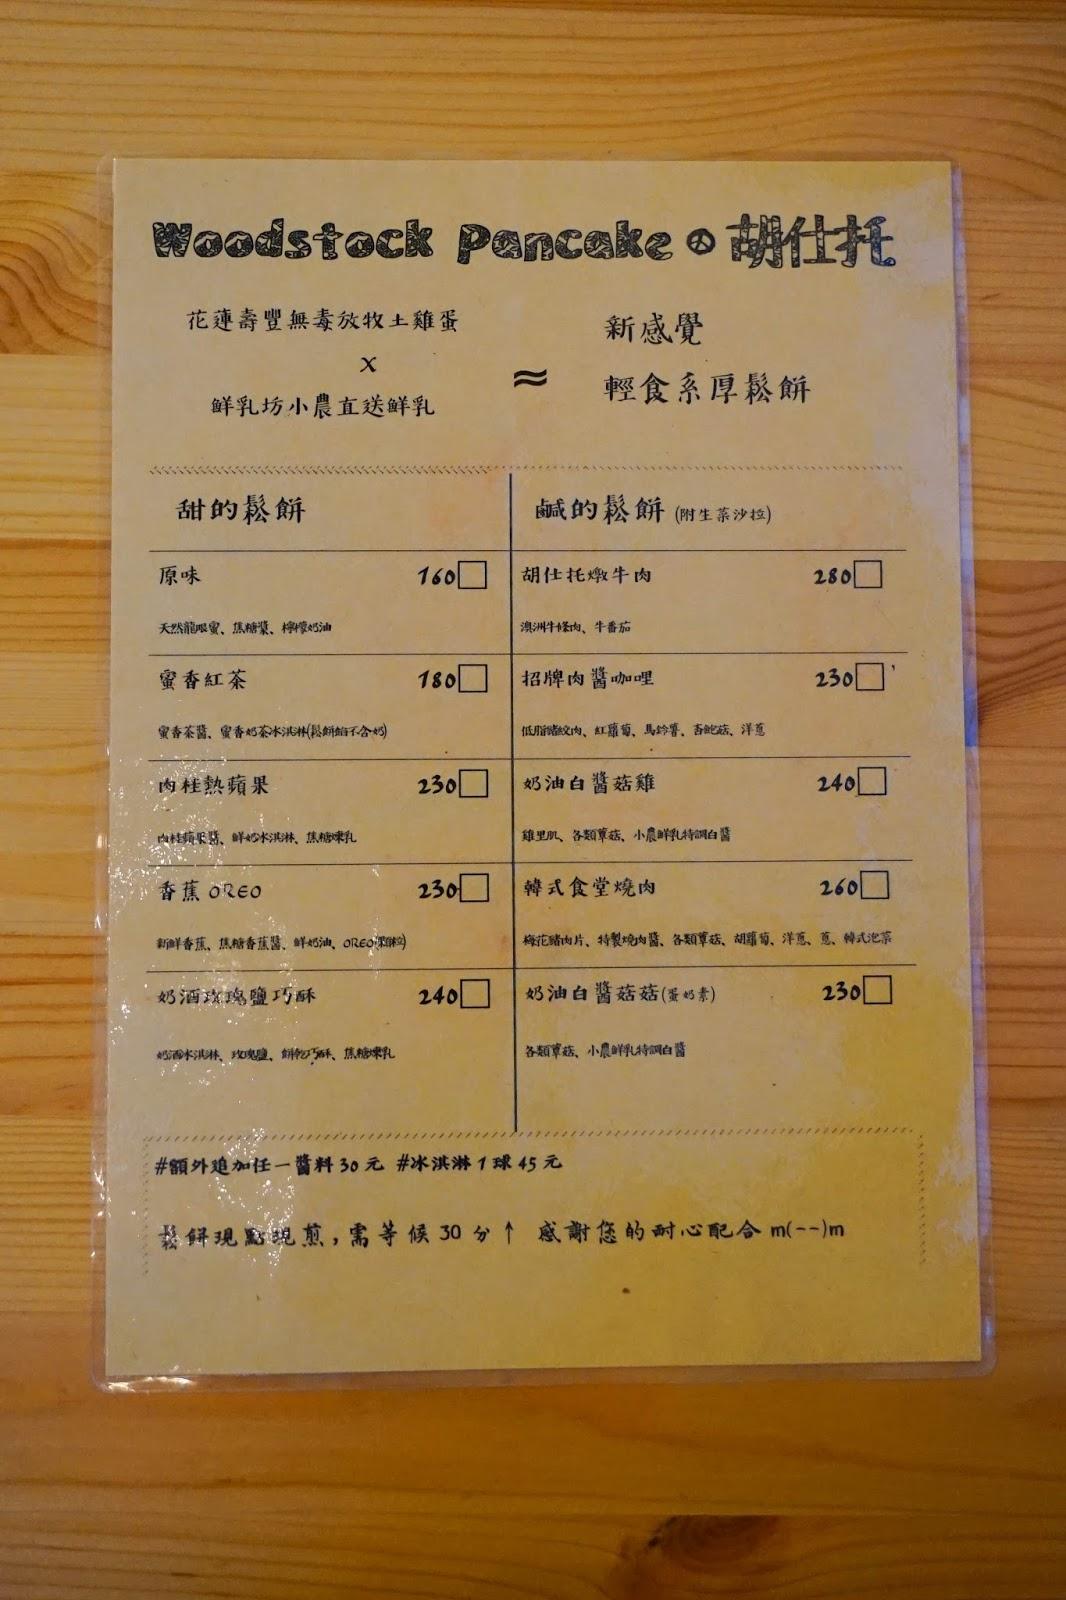 8-hualien-travel-woodstock-pancake-IMG_3627-beautyanxiety.com-hualien-desserts-woodstock-pancake